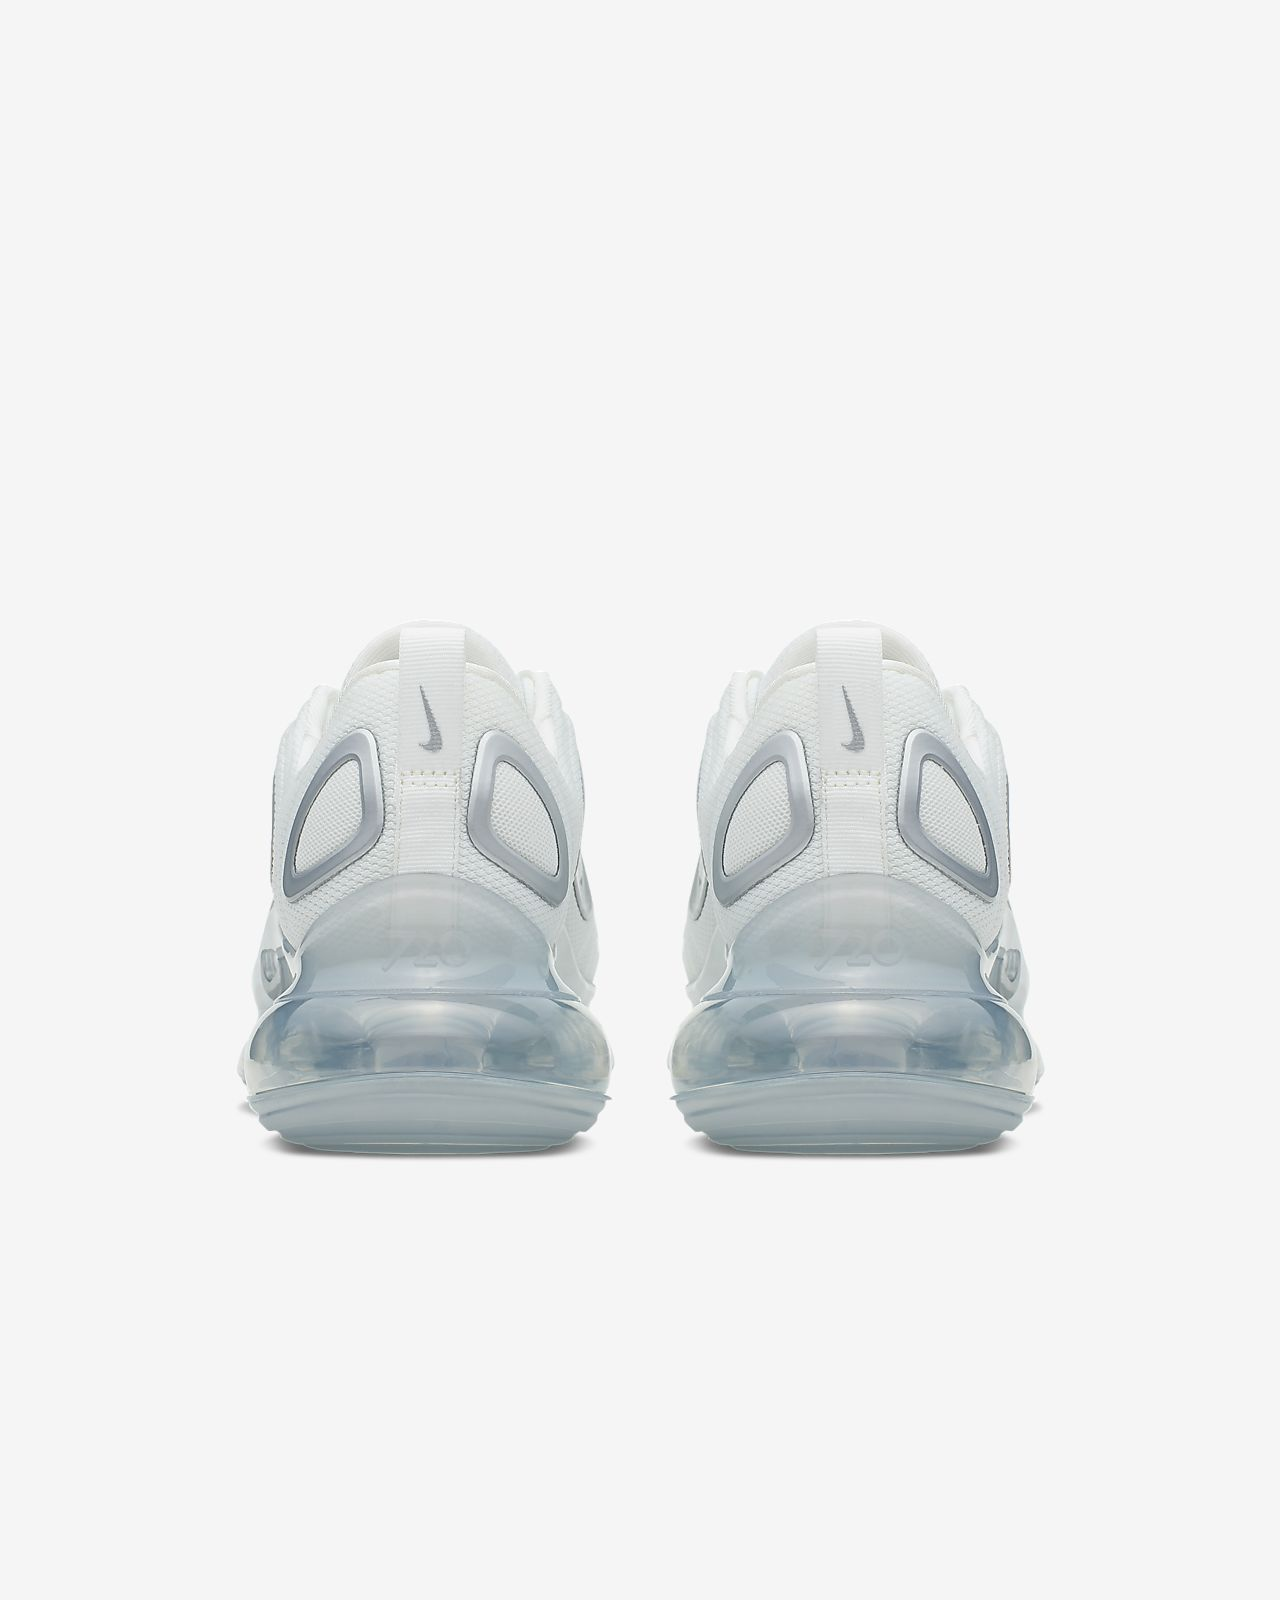 Femmeca 720 Max Pukixz Air Pour Nike Chaussure wP0X8nkZNO